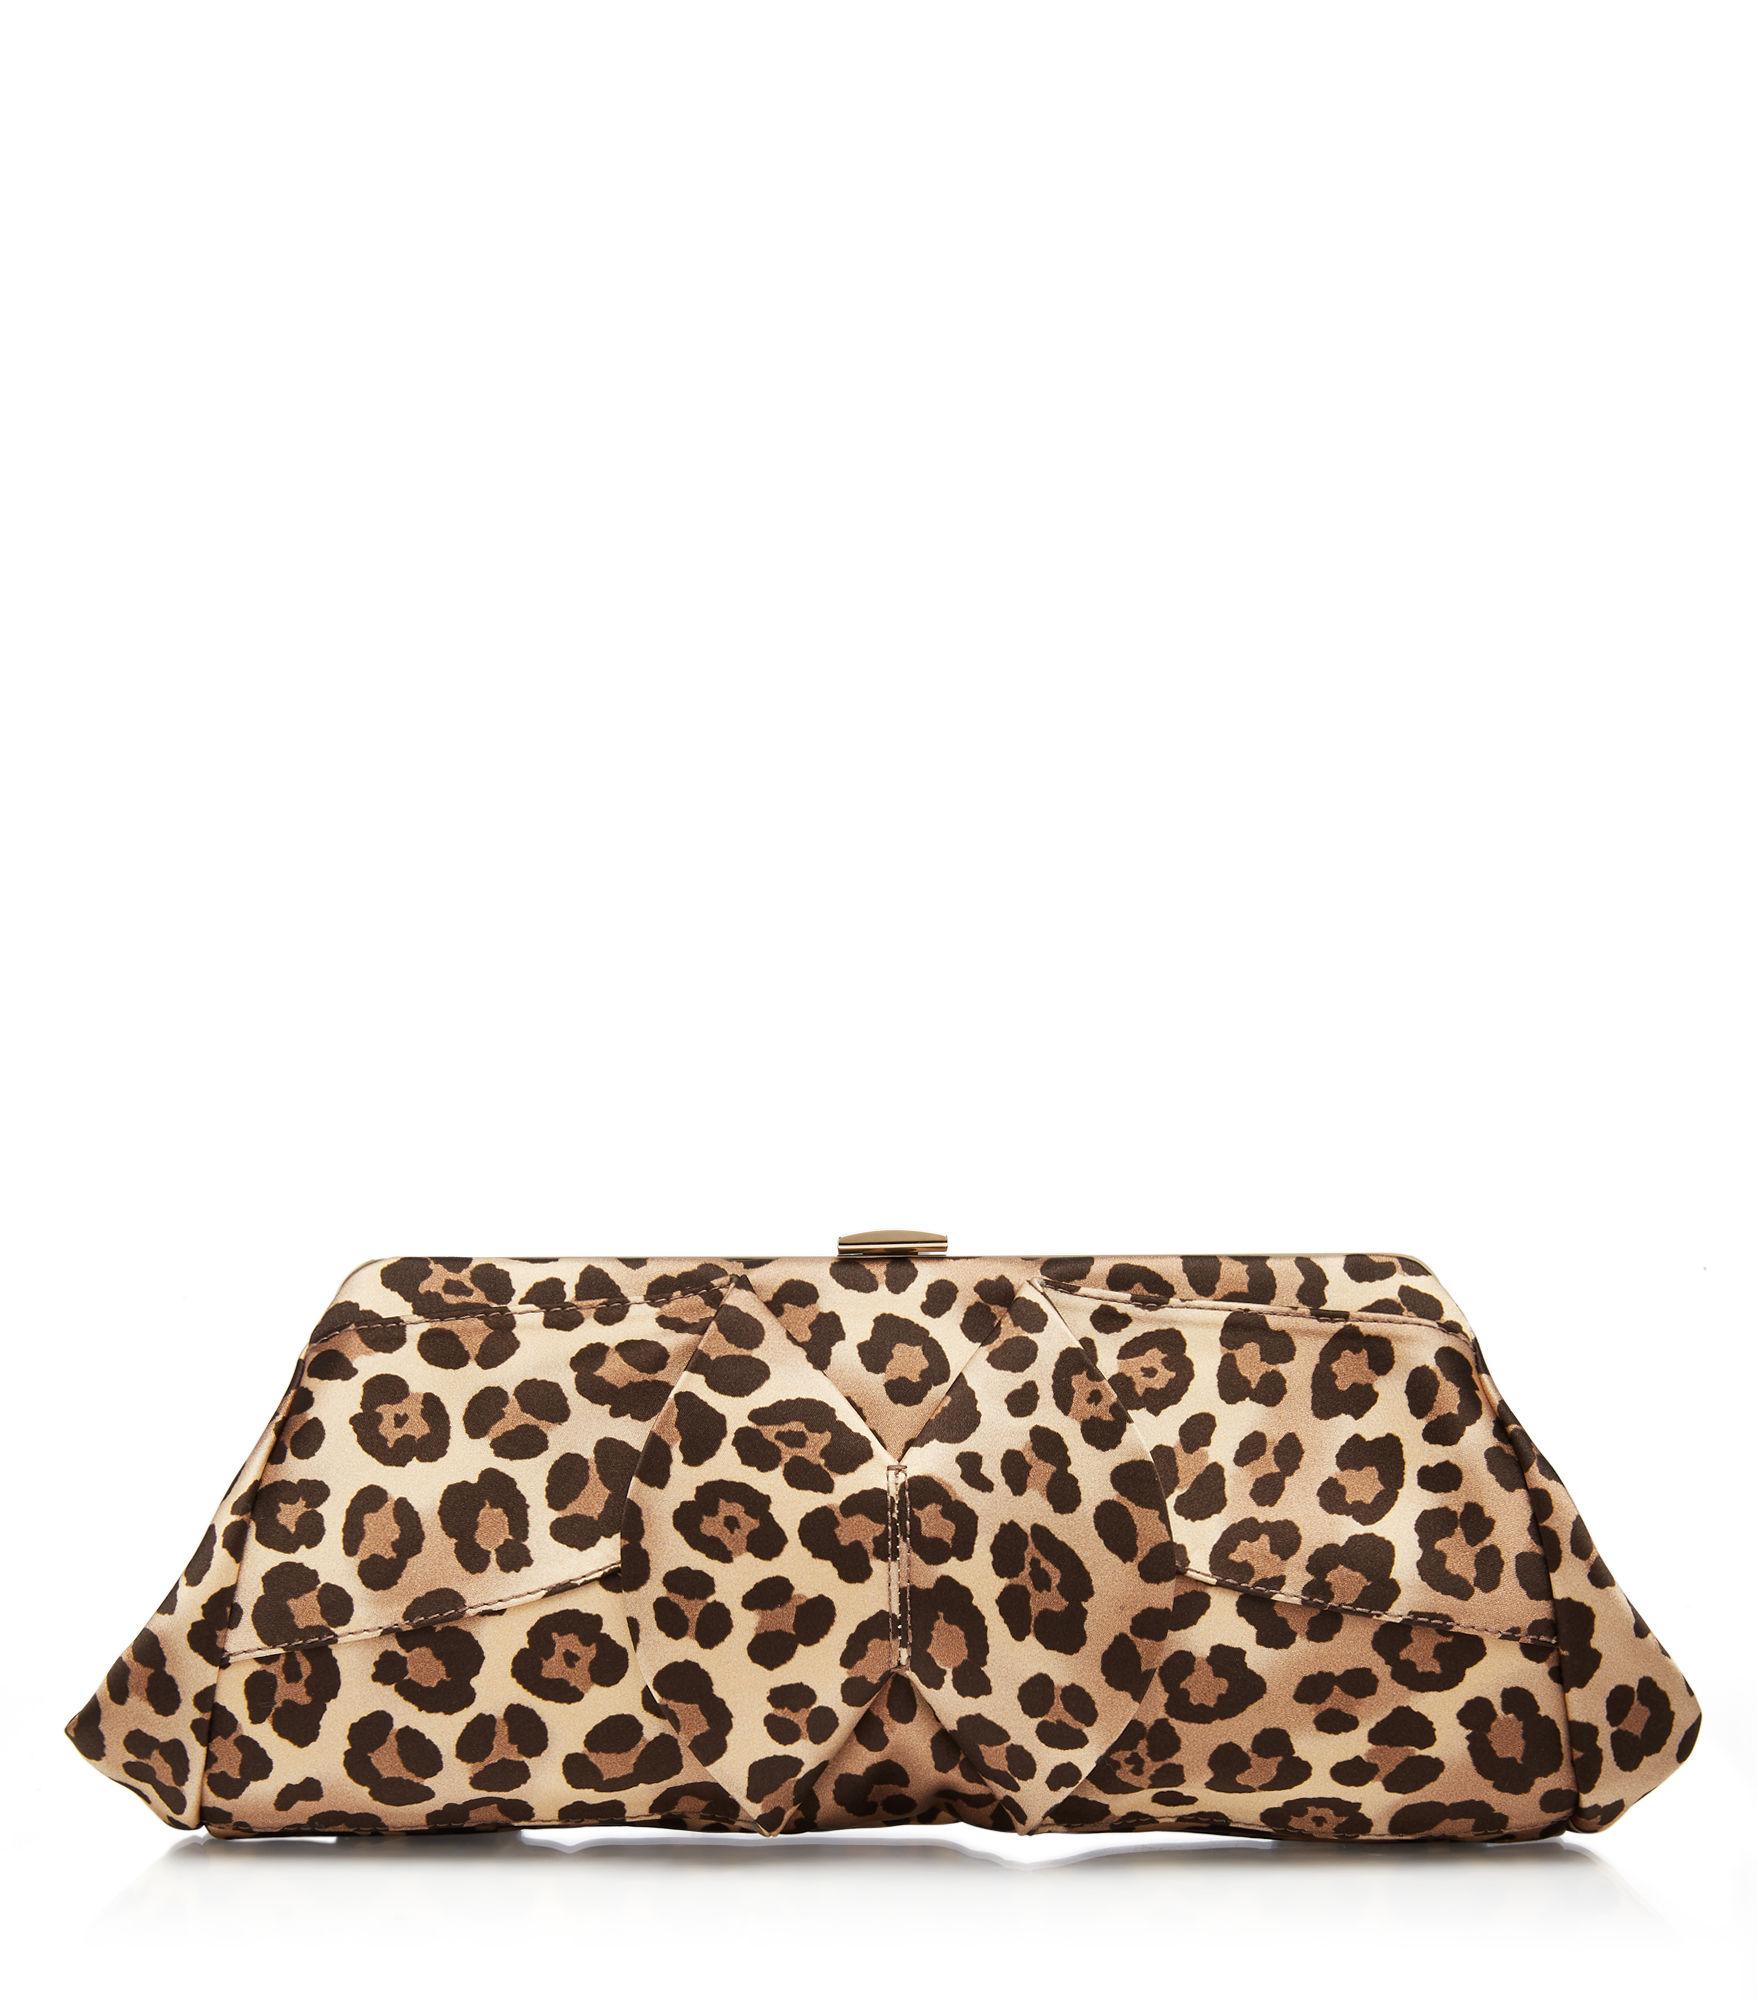 Charlotte Olympia Uptown Clutch In Leopard